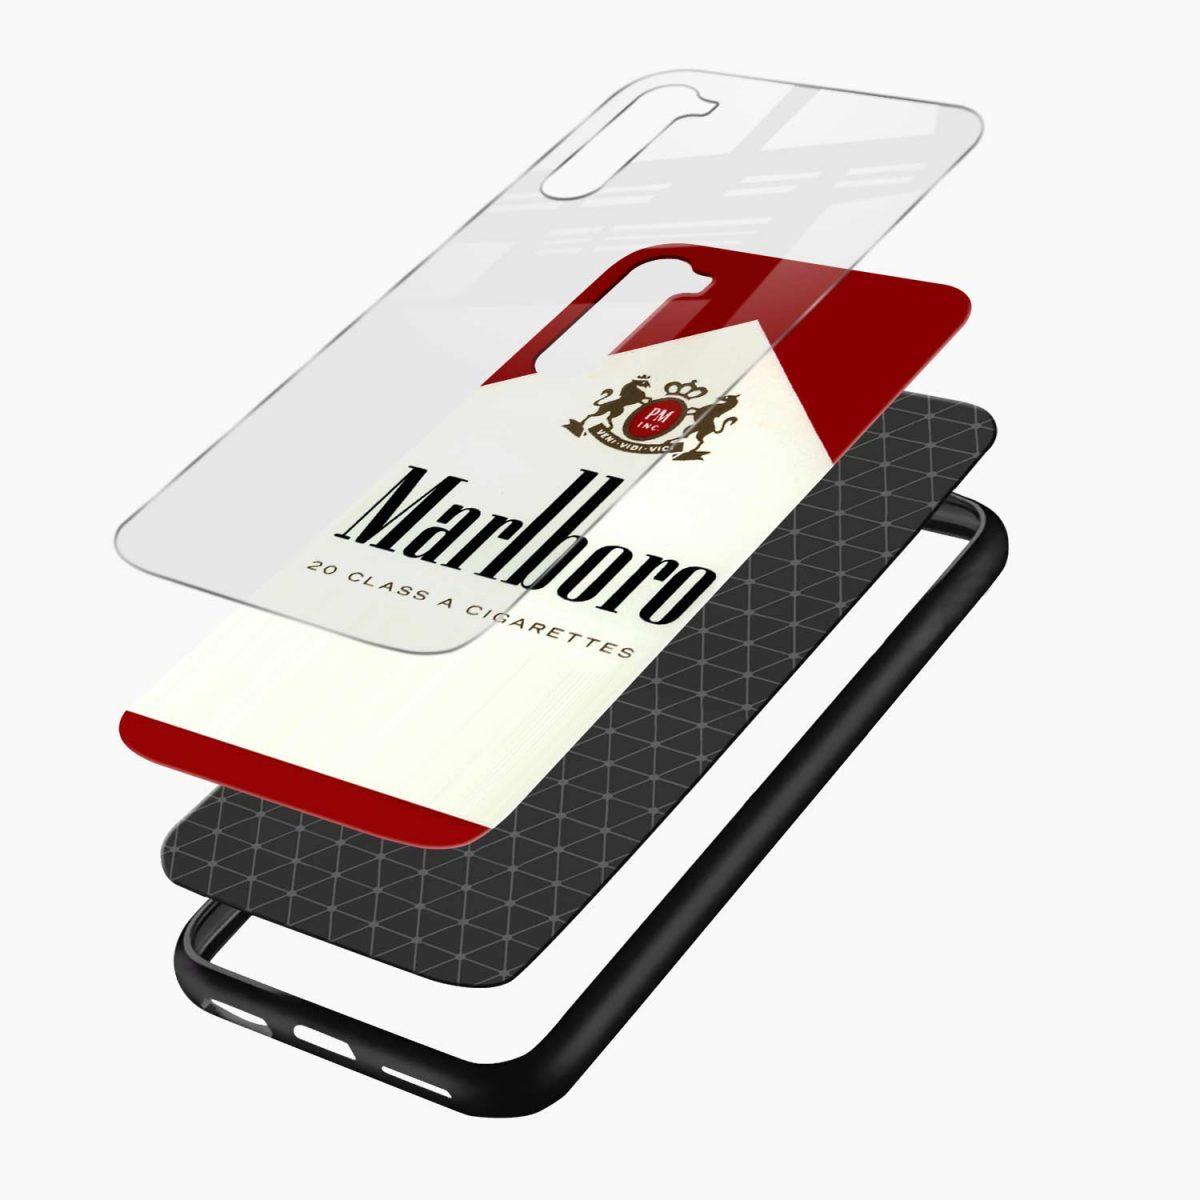 marlboro cigarette box layers view oneplus nord back cover